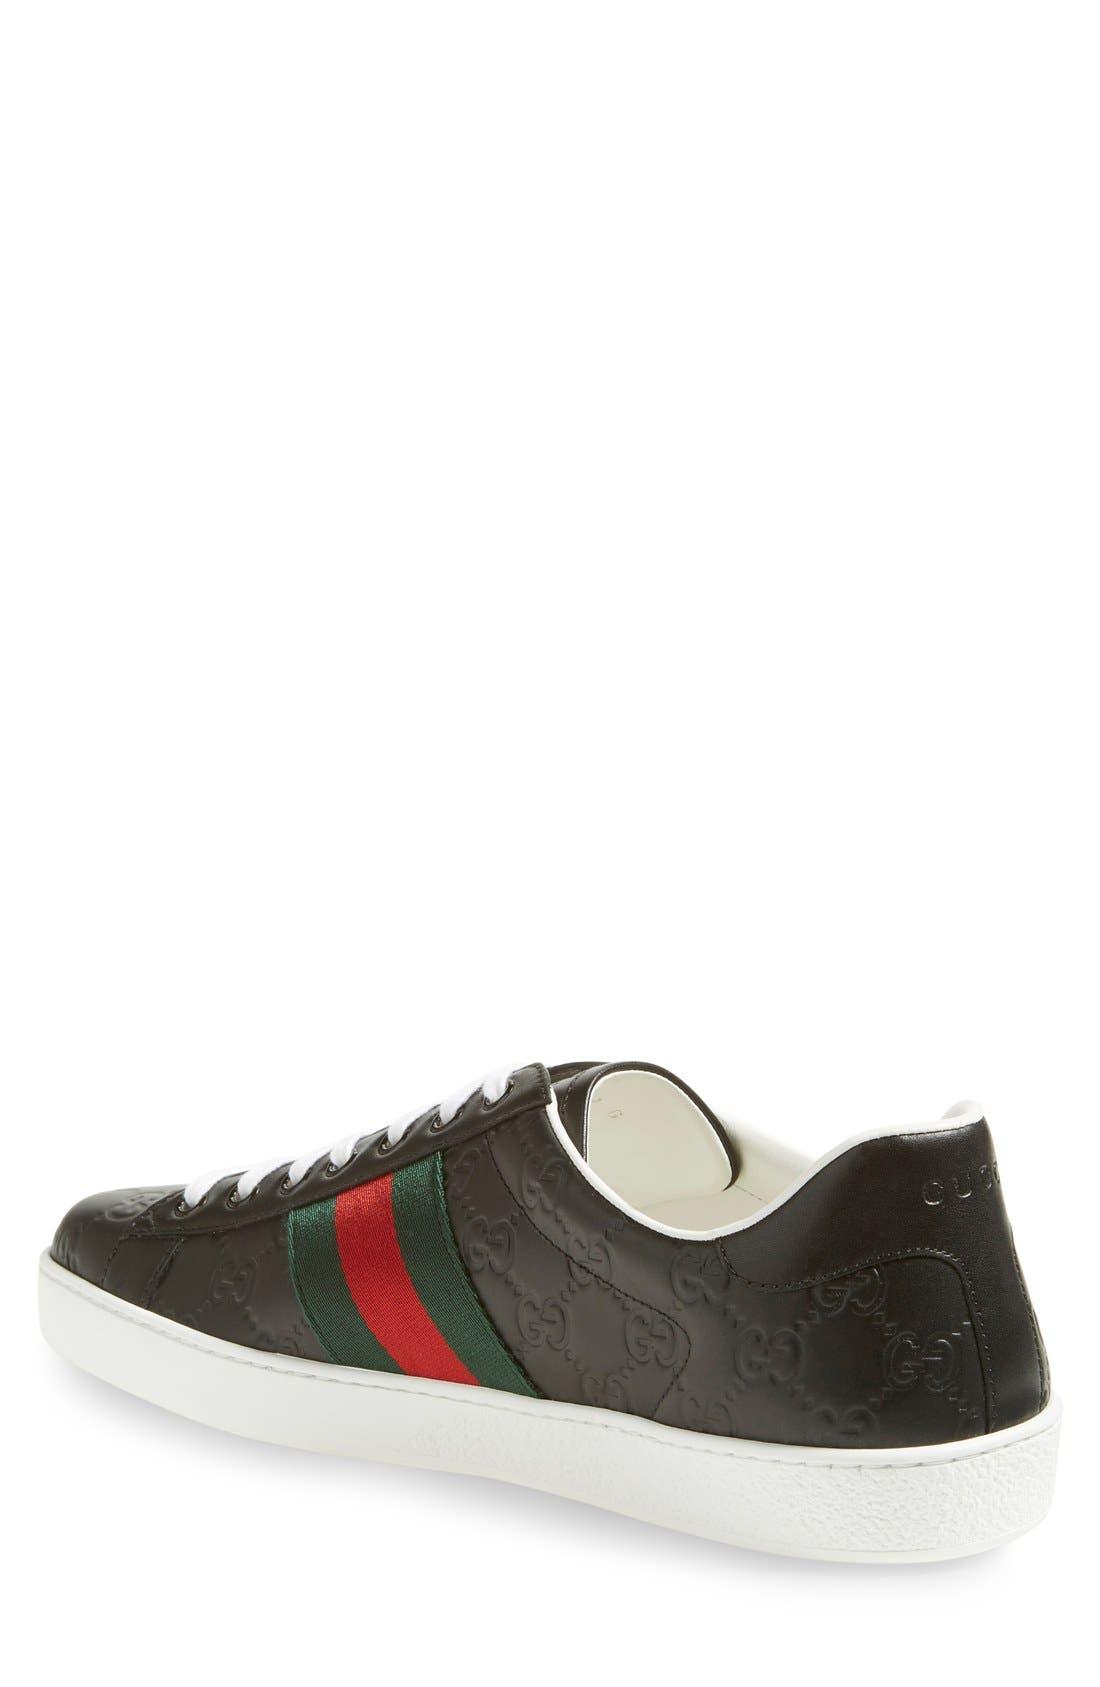 007aab9d425 gucci sneaker